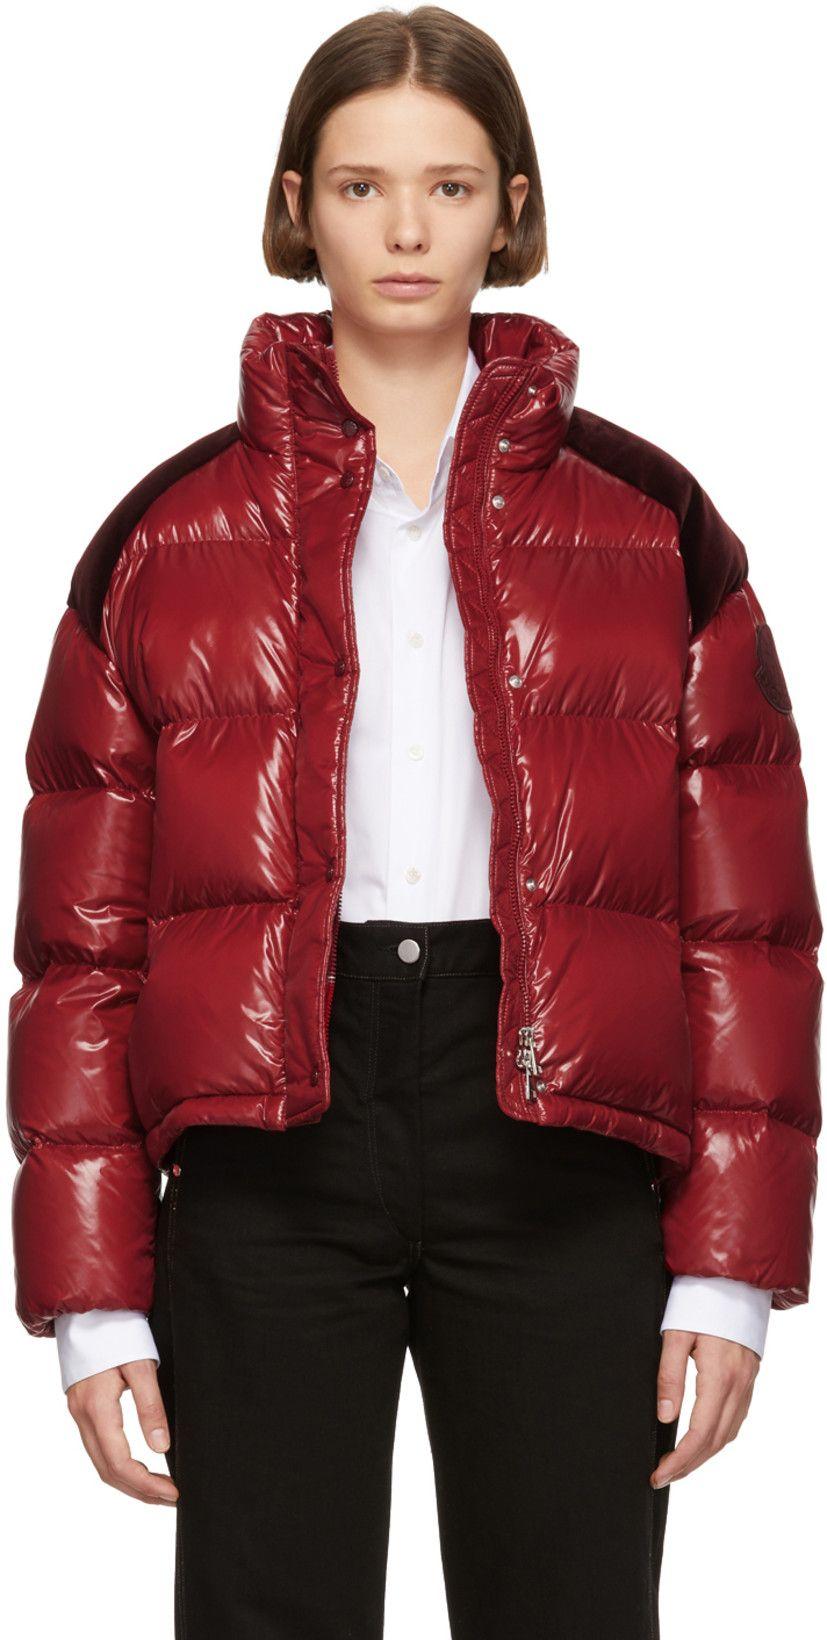 Moncler Genius 2 Moncler 1952 Red Chouette Down Jacket Moncler Down Jacket Jackets [ 1640 x 827 Pixel ]